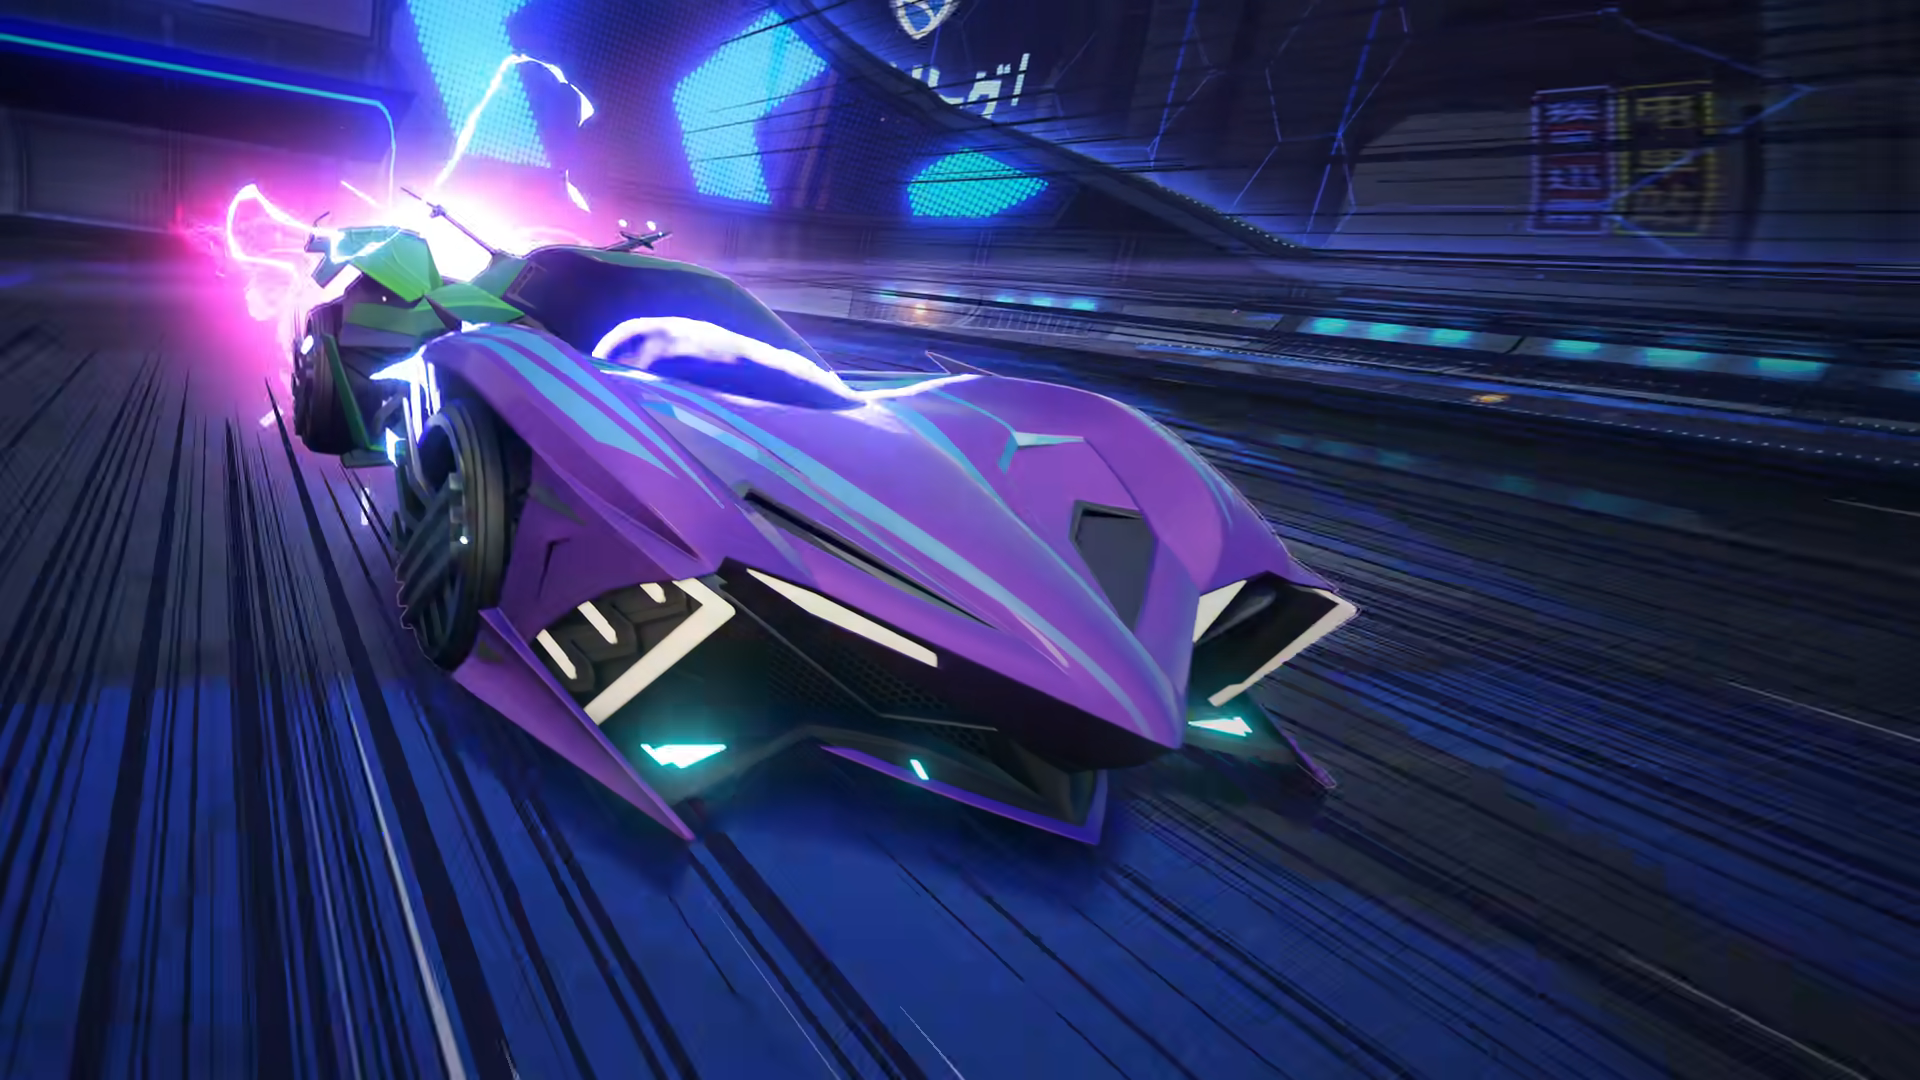 Psyonix New Rocket League Update Surprises Fans With Price Of Blueprints Competitive Nintendo Pc Rocket League Rocket League Art Rocket League Wallpaper